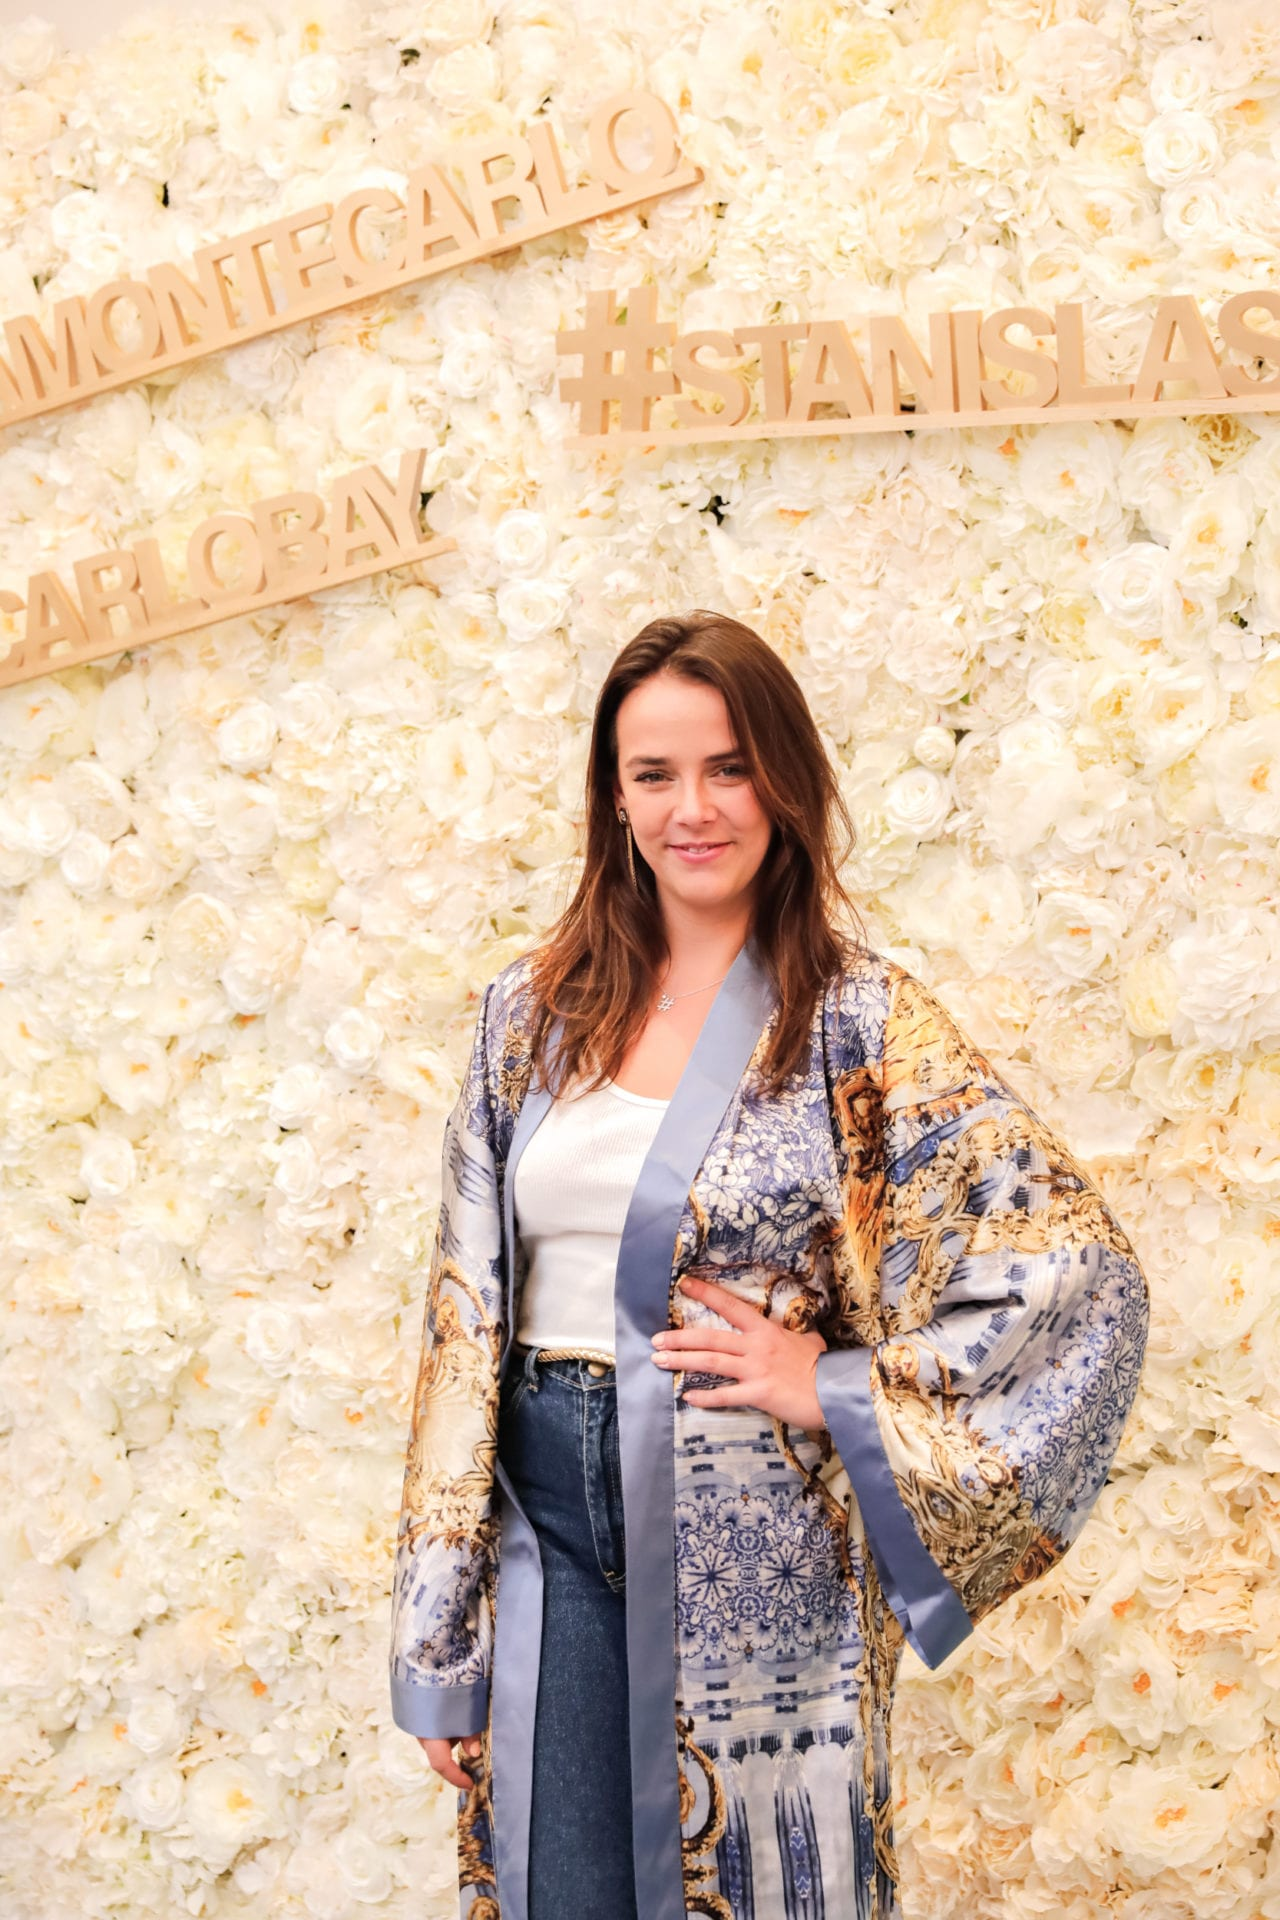 Monaco Princess Pauline Ducruet wearing Diana d'Orville sustainable luxury silk kimono at Influencers Awards Monaco brunch